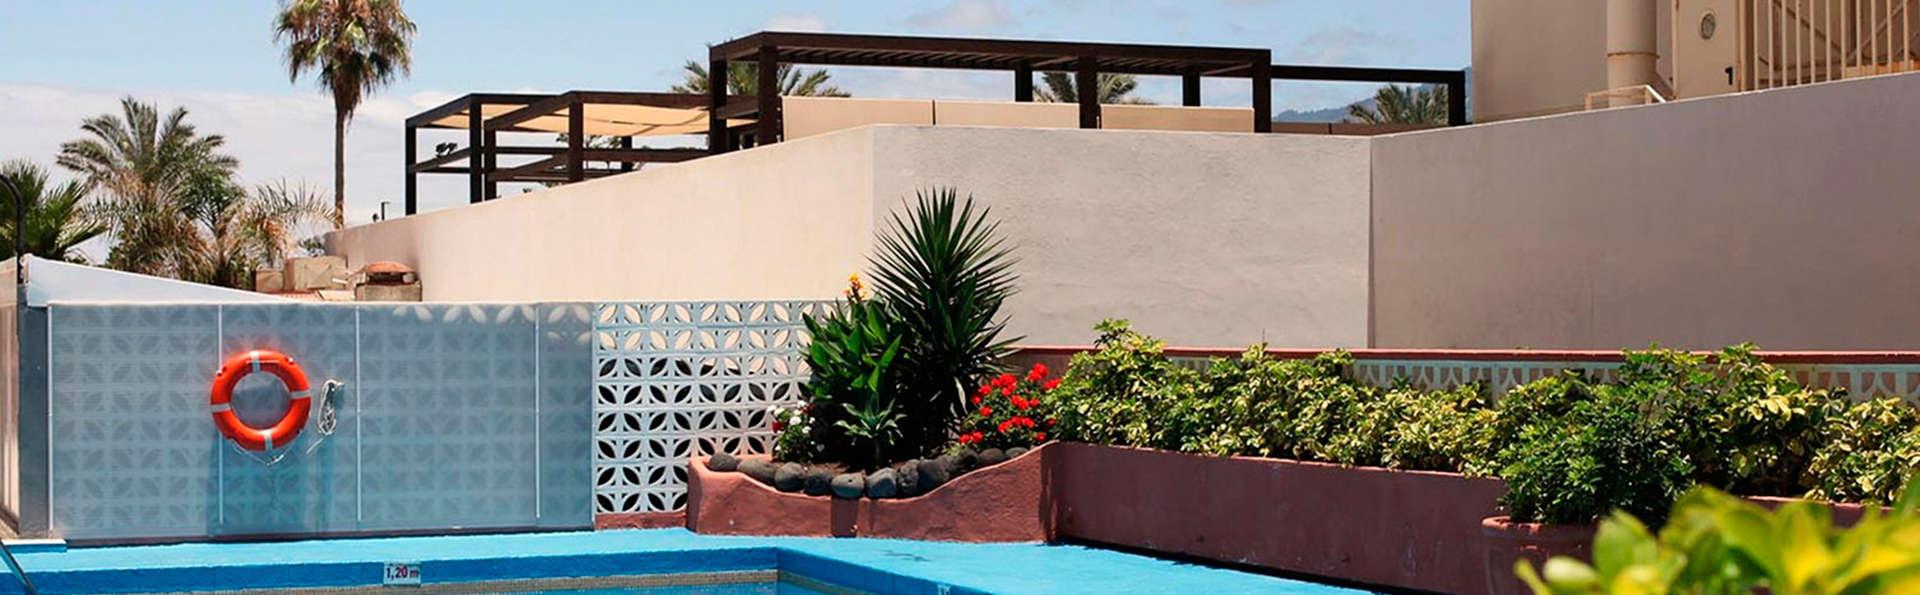 Checkin Concordia Playa - EDIT_pool.jpg